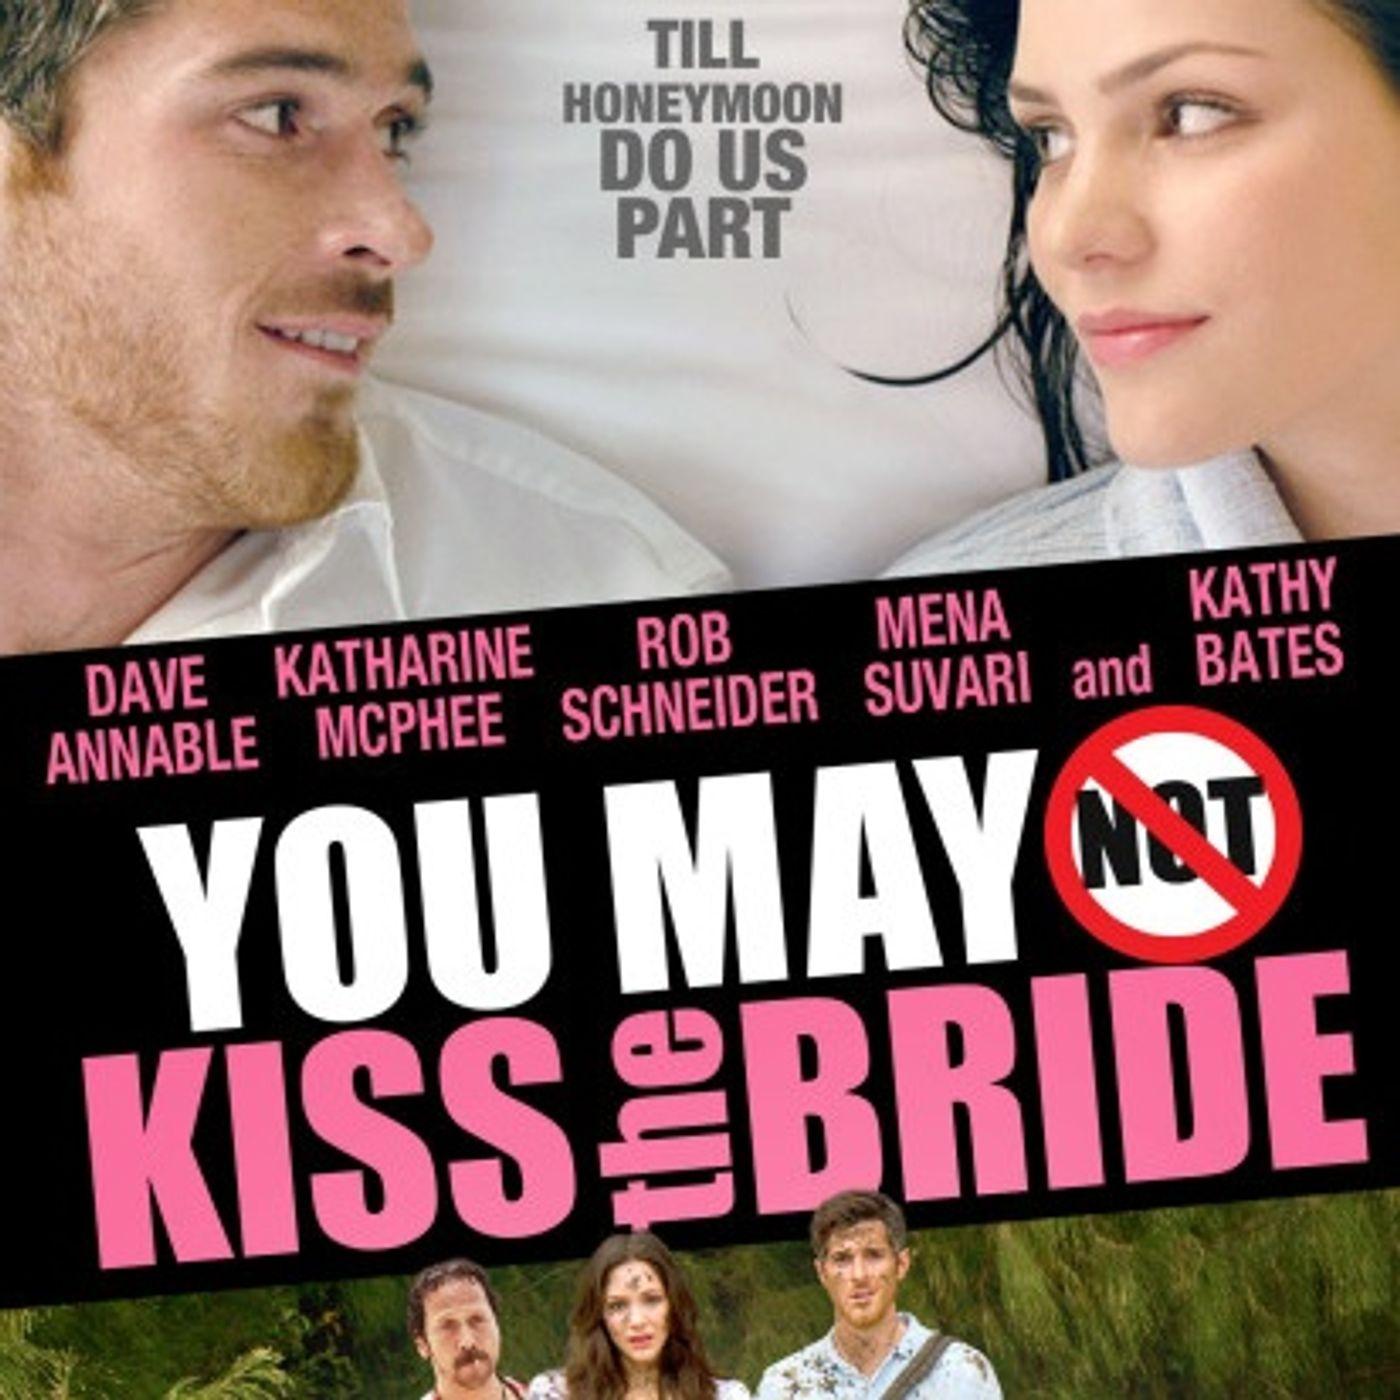 104 - You May Not Kiss the Bride (Adam Sandler Film School)